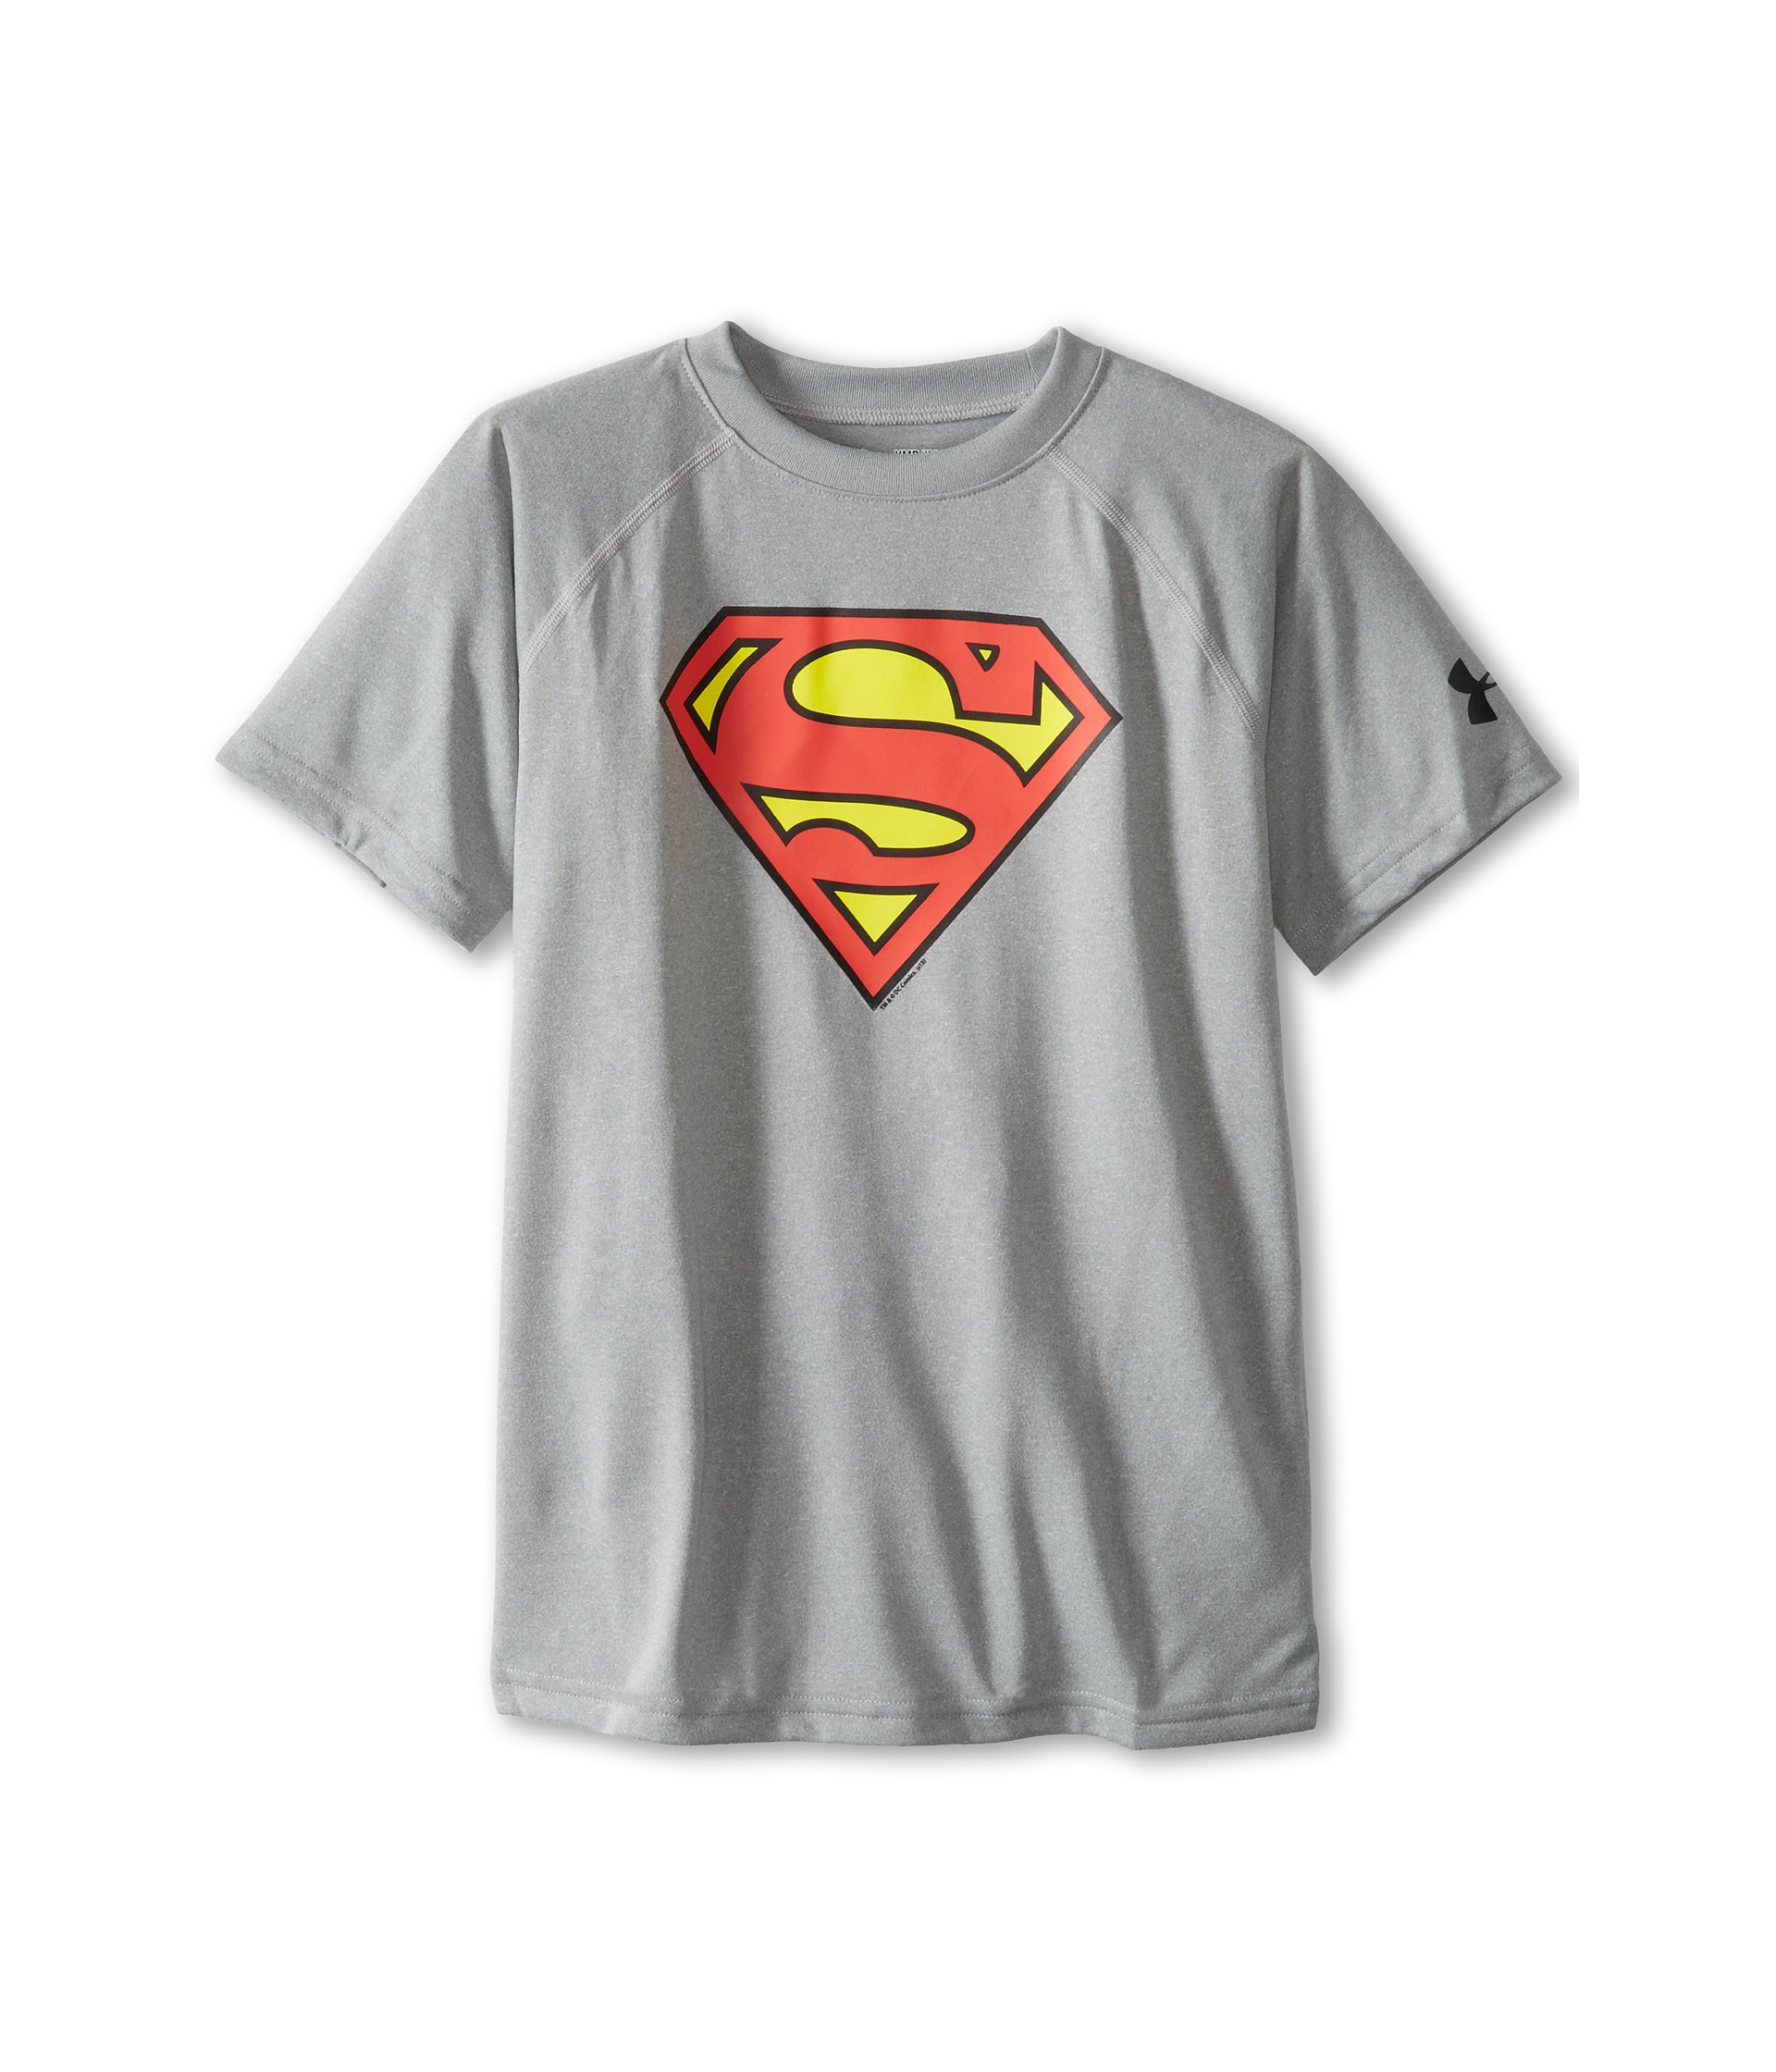 Under armour kids alter ego superman t shirt big kids for Under armour shirts for kids